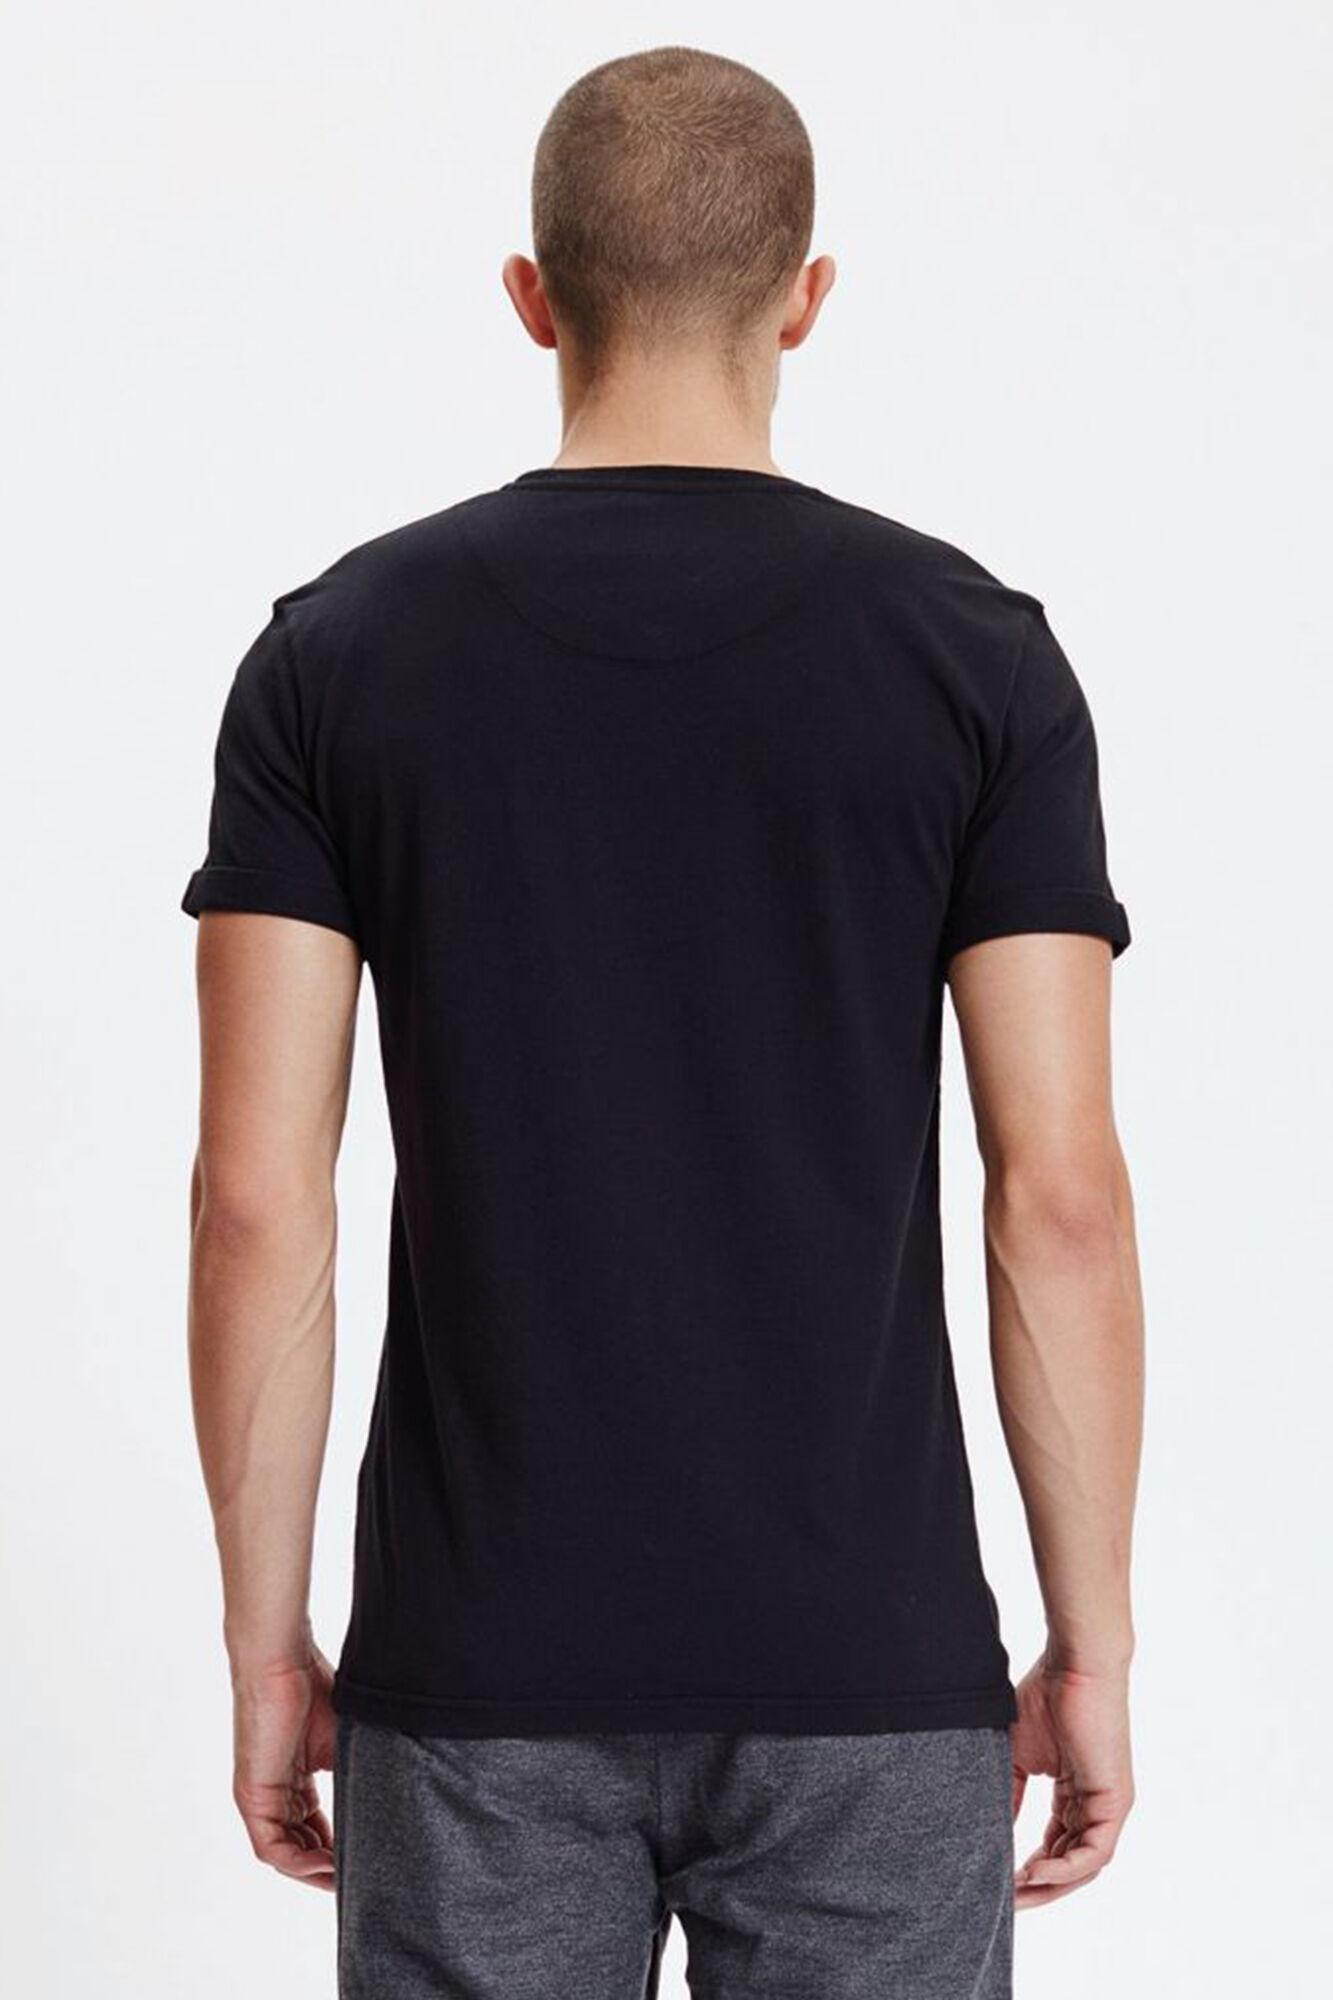 Nørregaard T-shirt LDM101008, BLACK